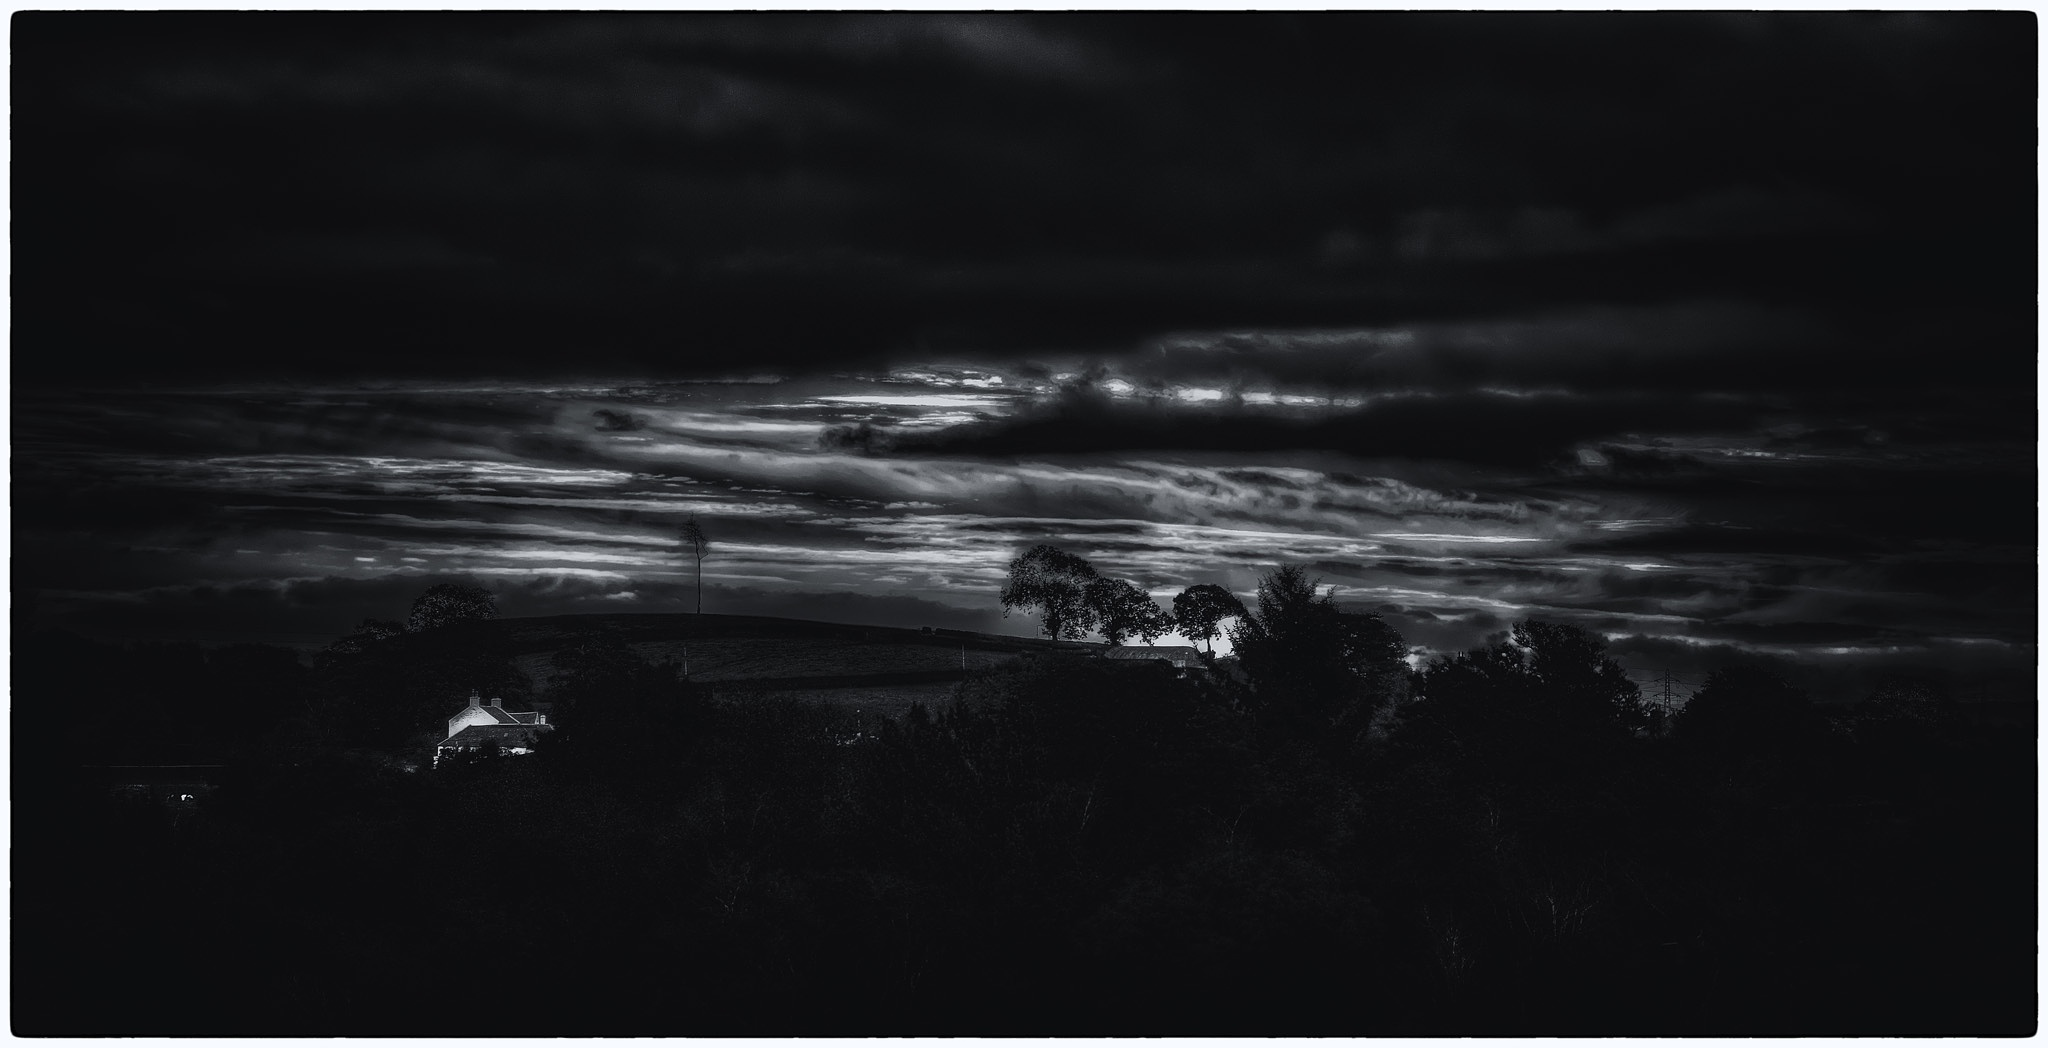 Long dark night turn to sunrise by scrawcreations  (Stephen)